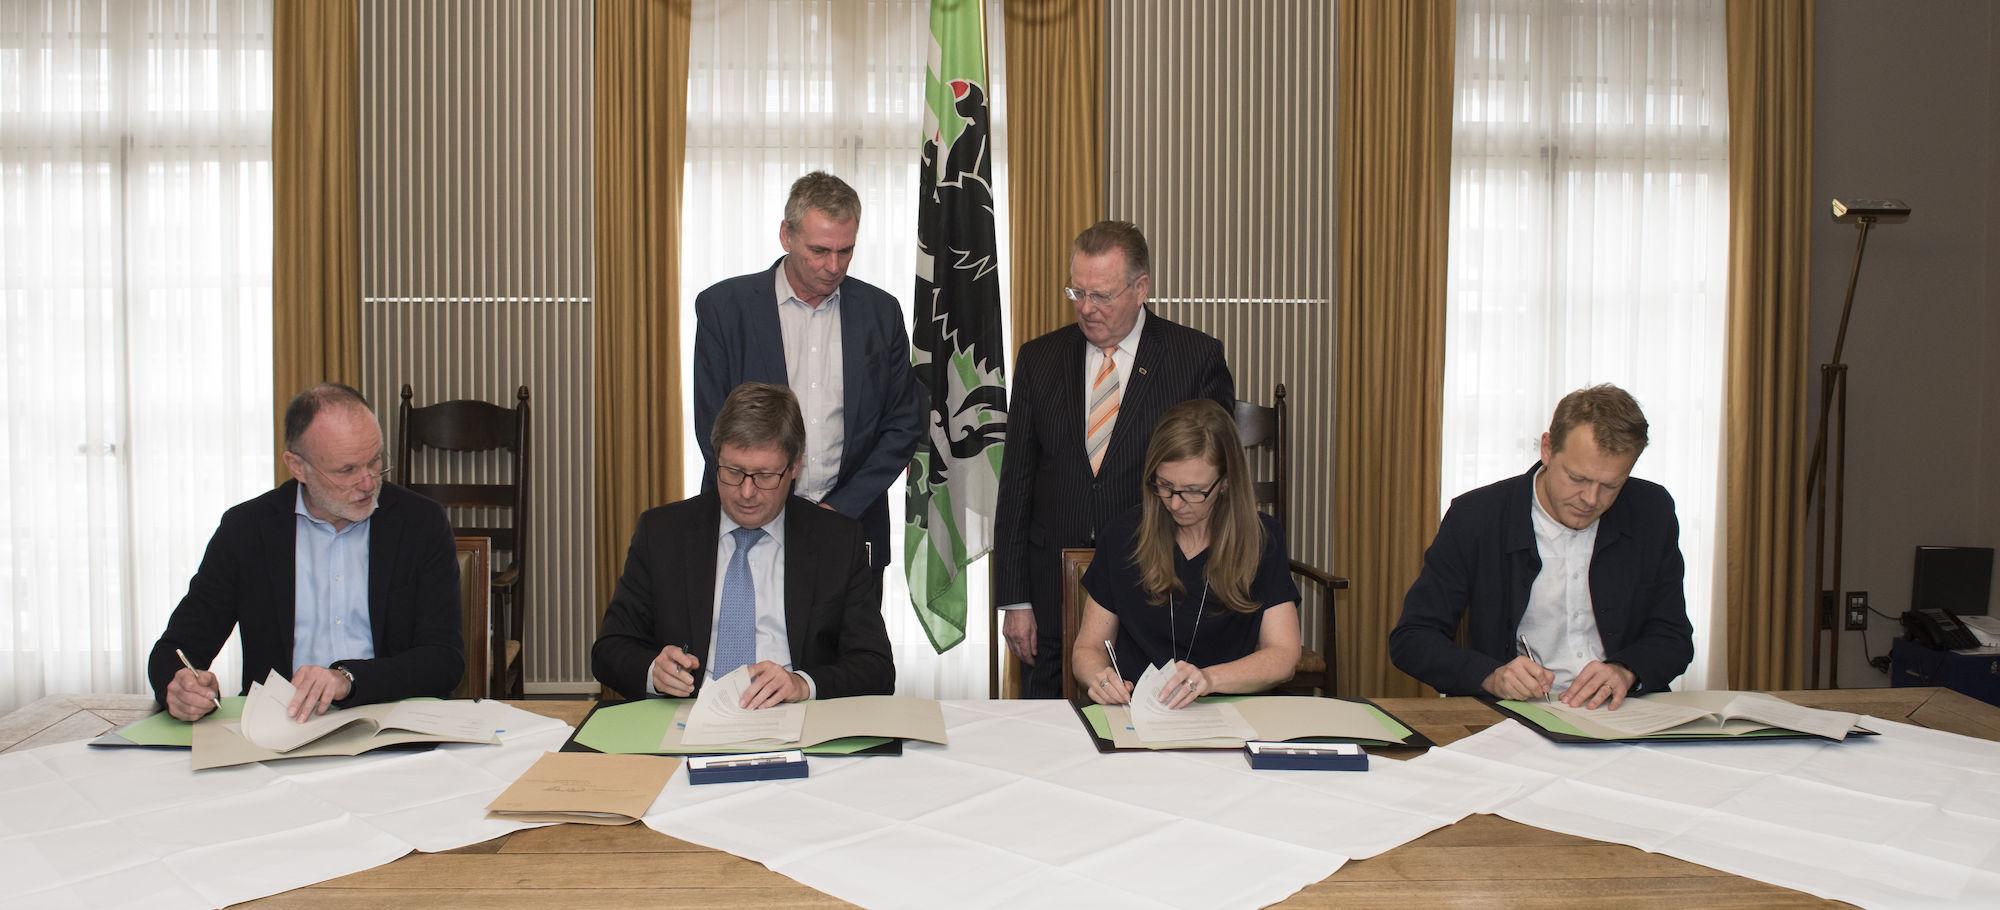 180309-ondertekening-overeenkomst-realisatie-Leopoldskazerne-00008.jpg